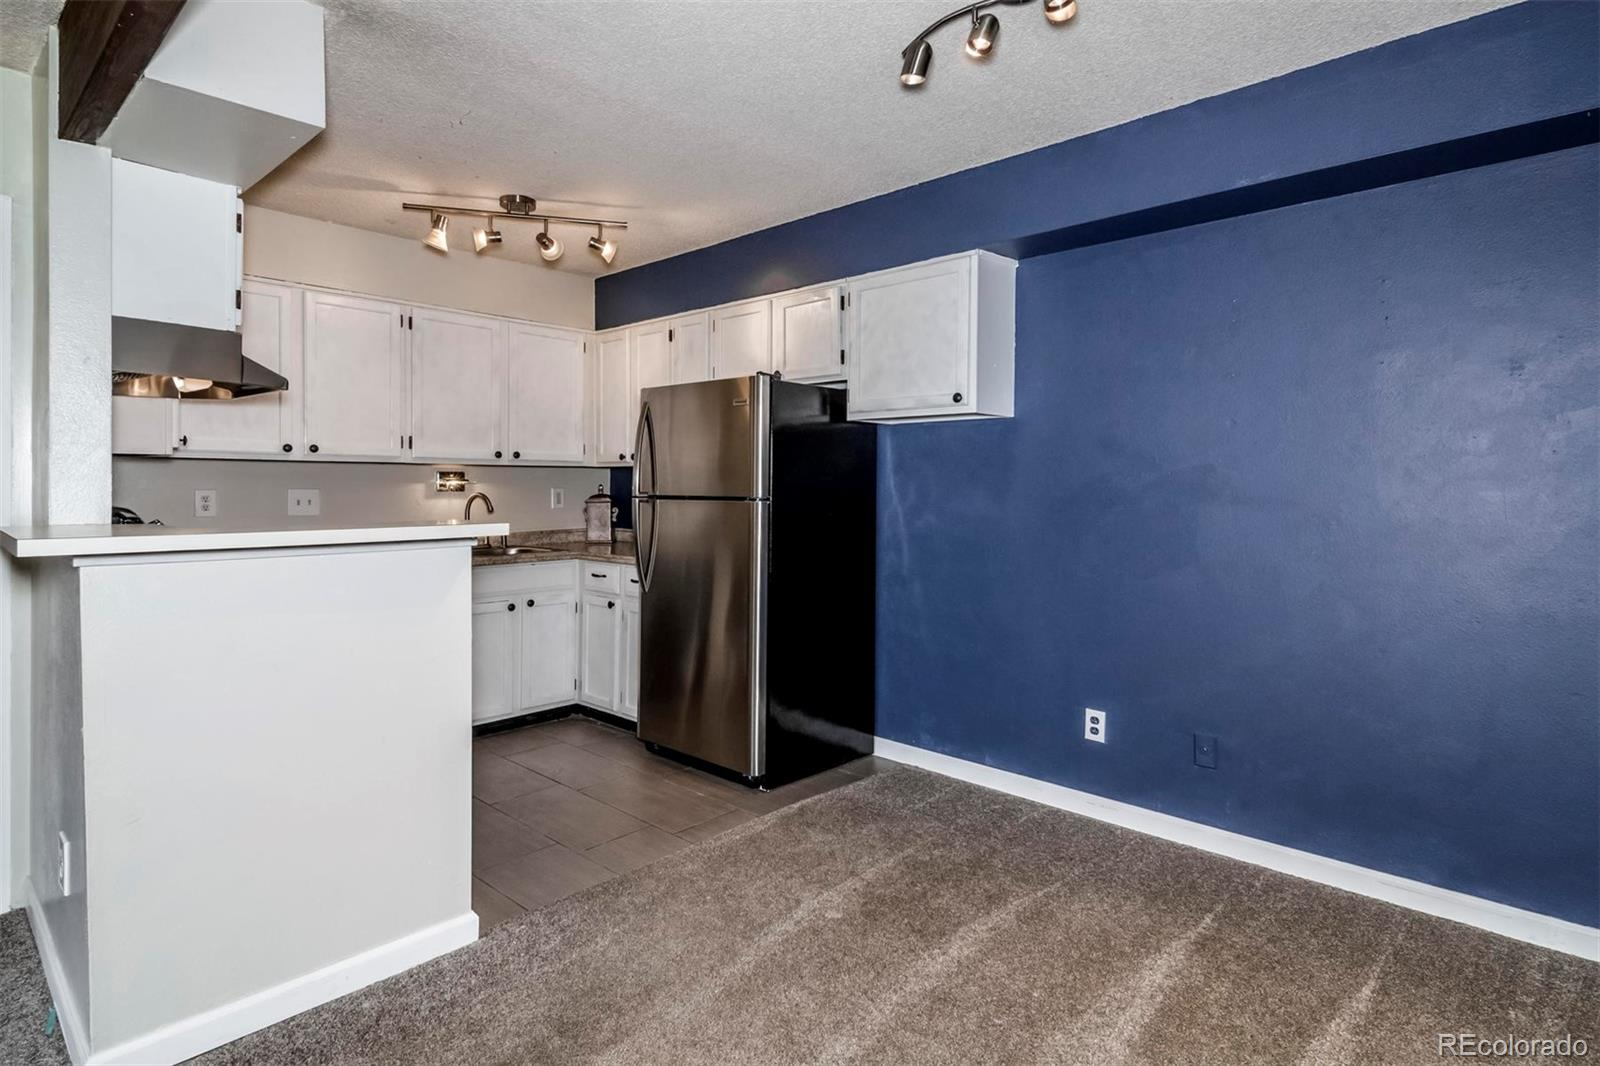 MLS# 6340316 - 8 - 420 Zang Street #3-102, Lakewood, CO 80228